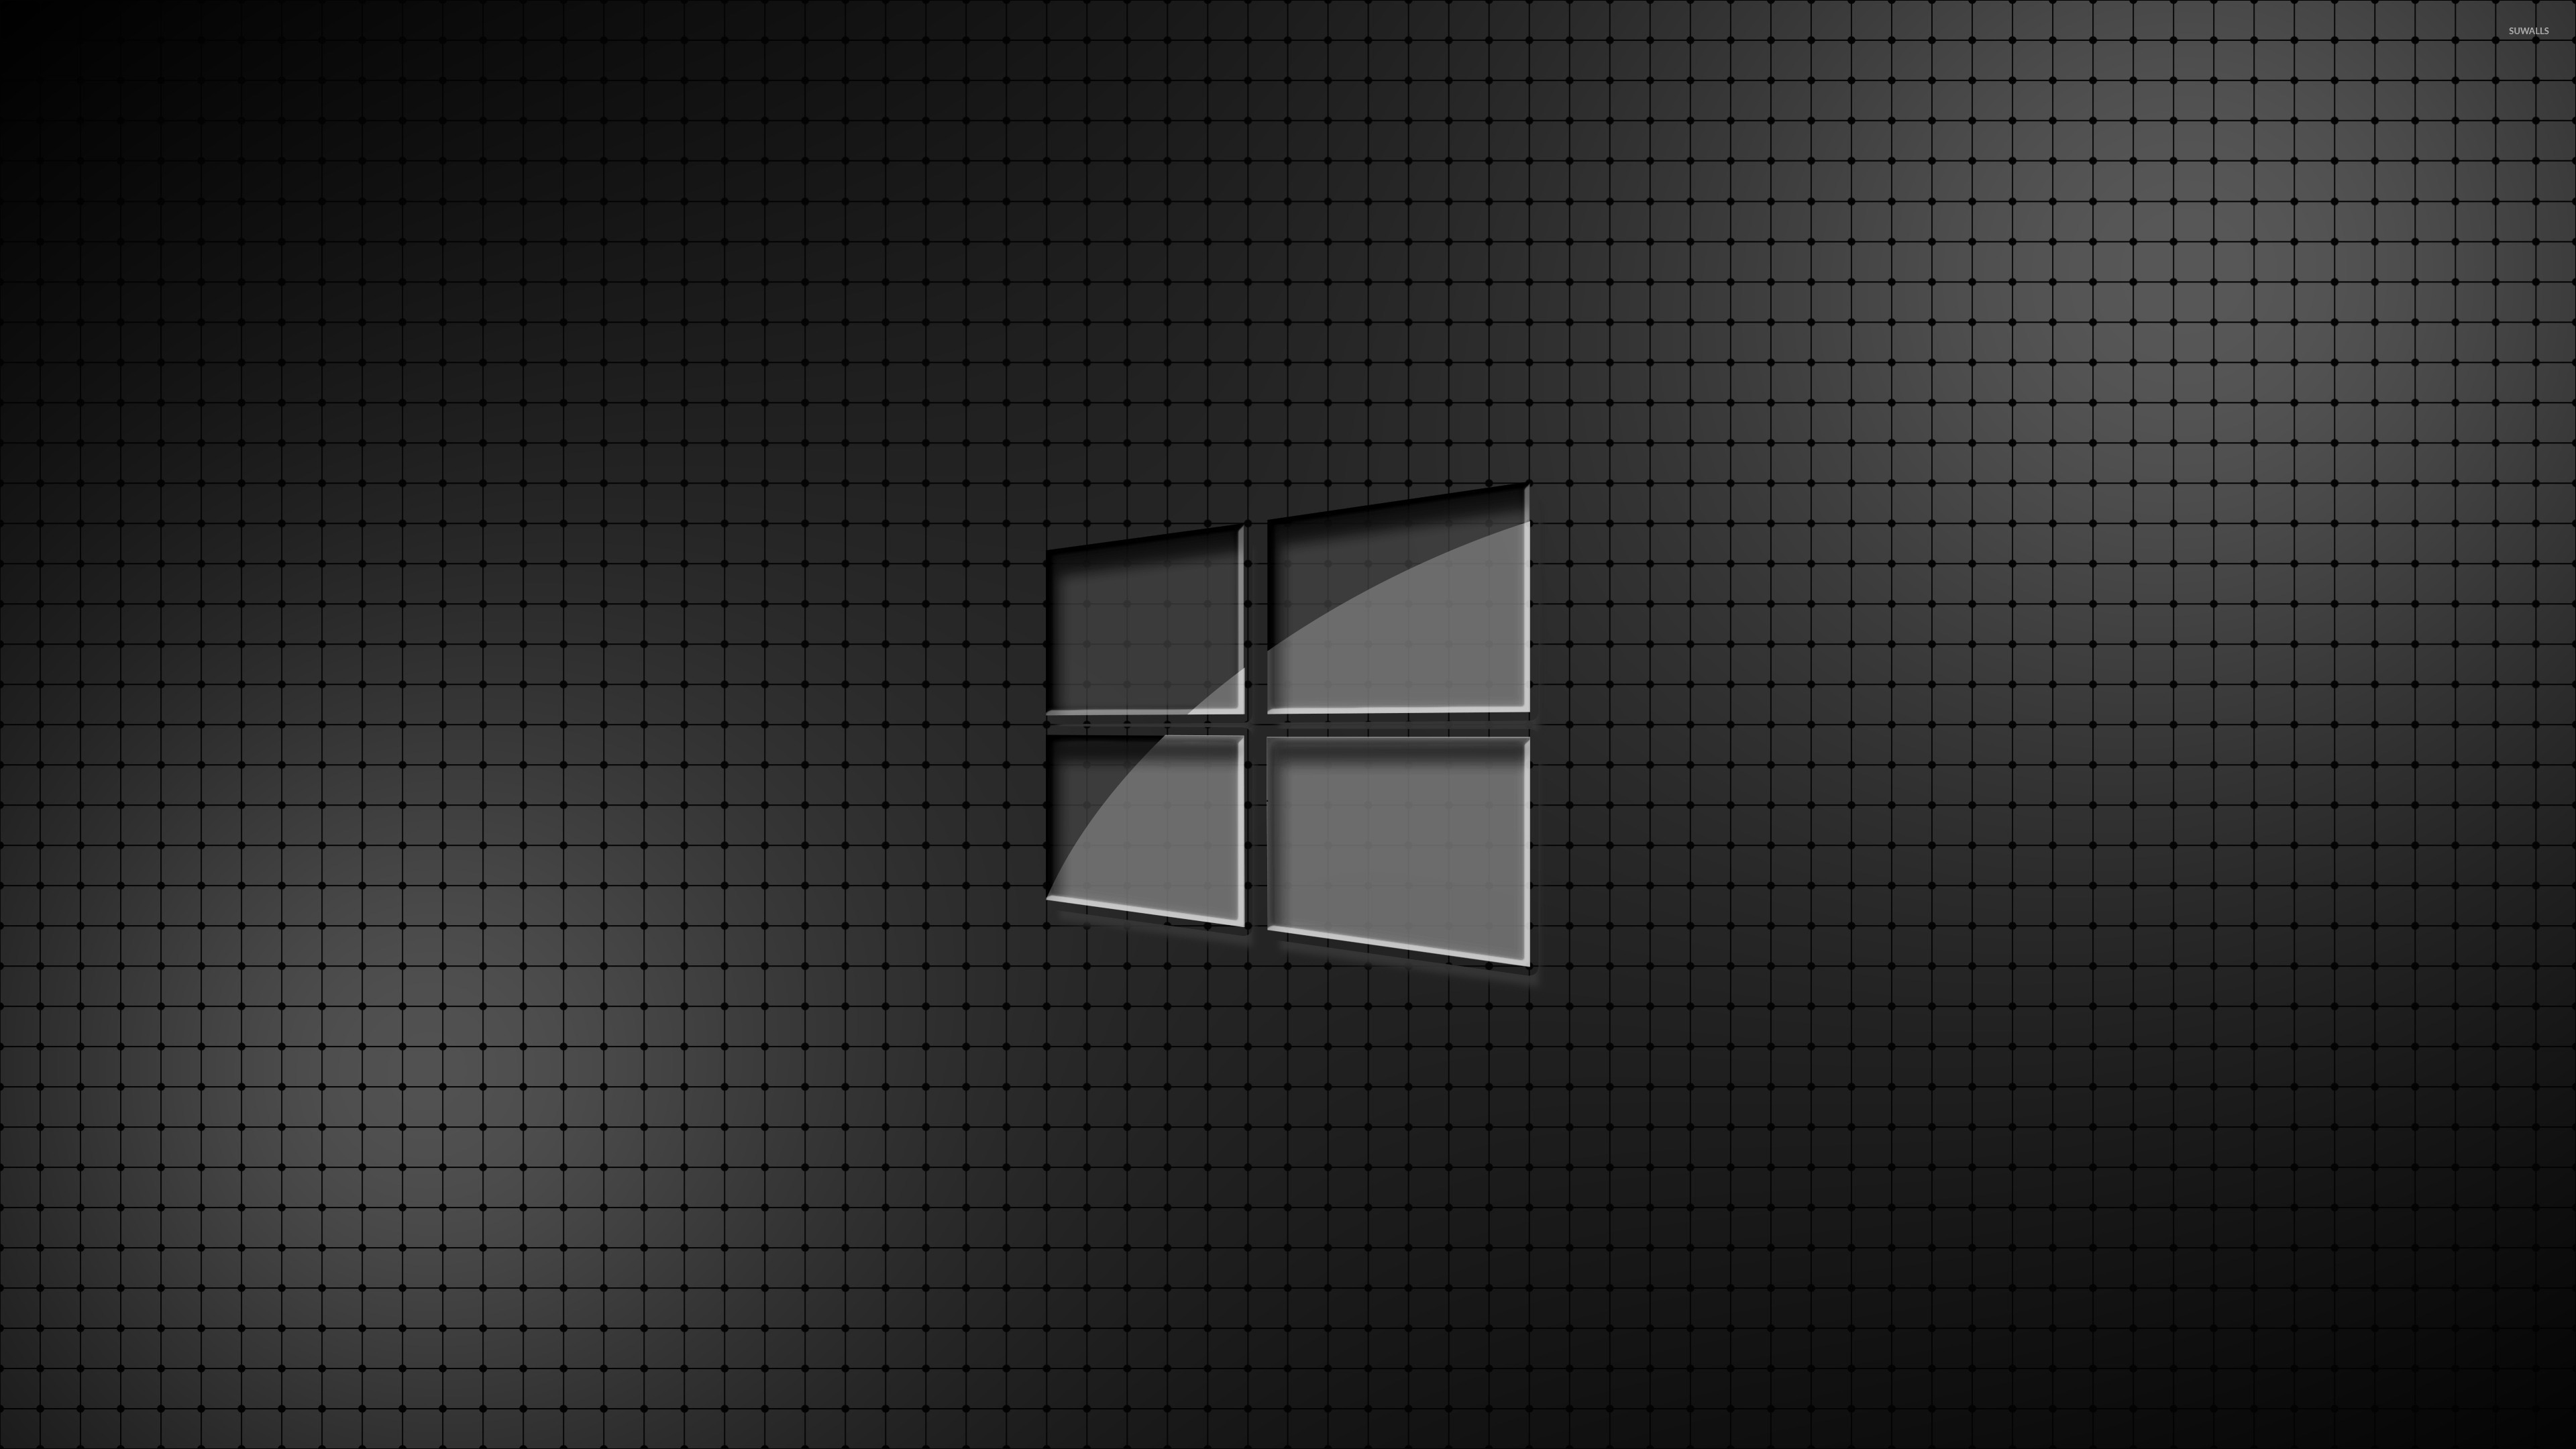 Dual Screen Wallpaper Fall Glass Windows 10 On A Grid Wallpaper Computer Wallpapers